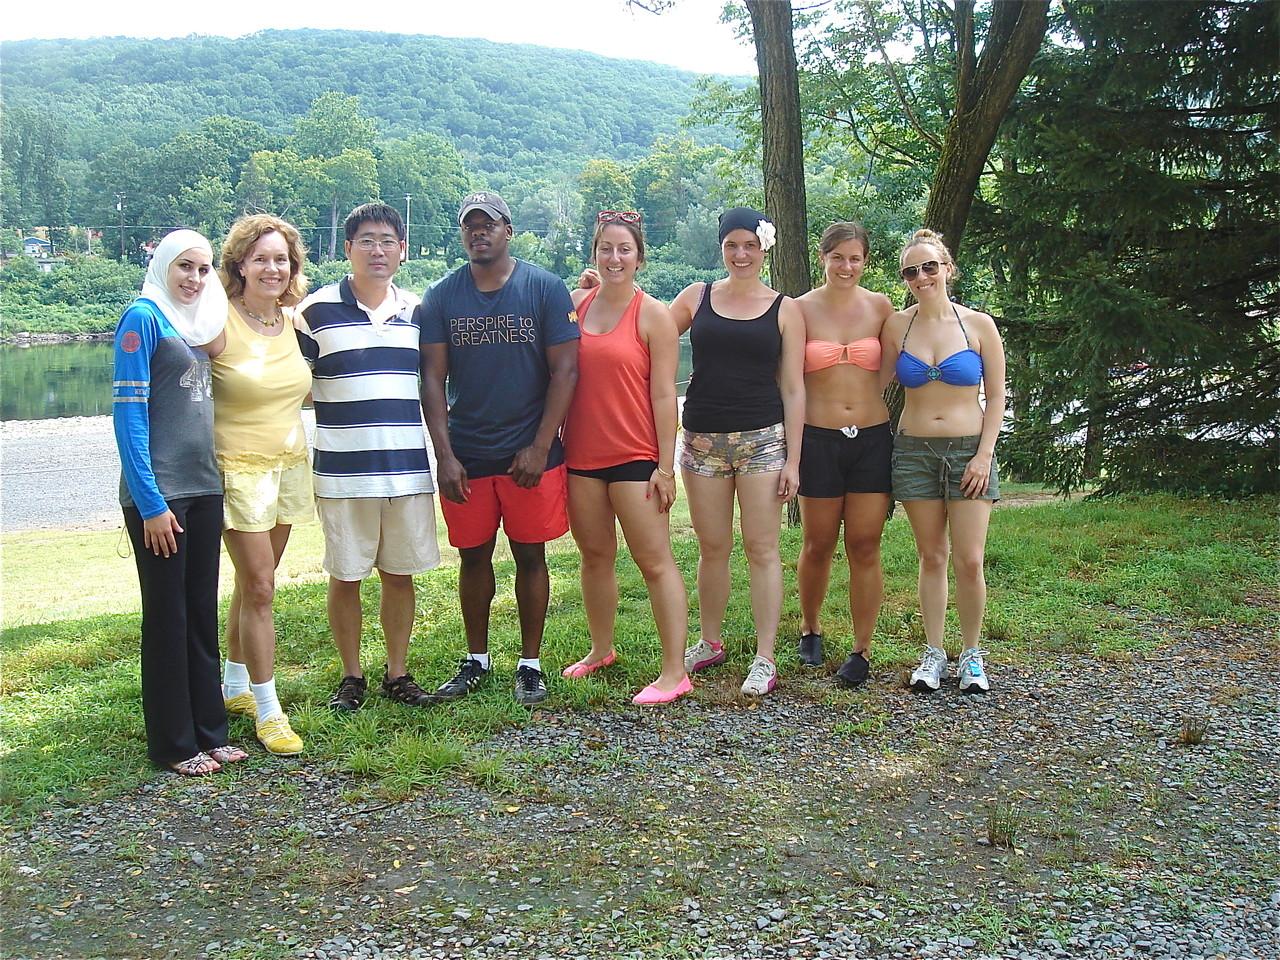 Gudas Lab Trip, July 23, 2013  Kayaking in the Catskills!